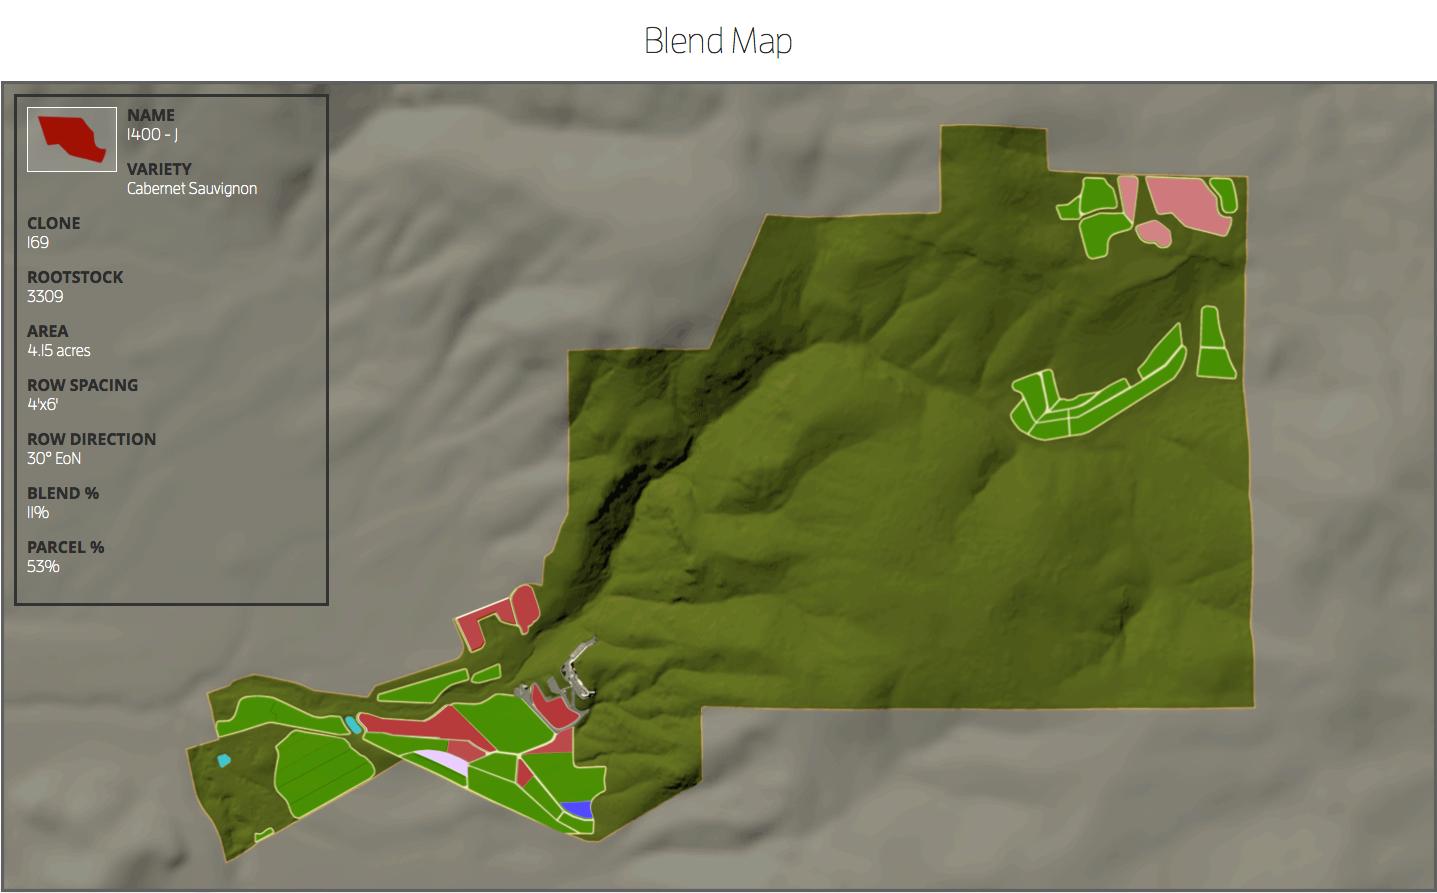 Blend map for the 2011 Palmaz Vineyards Cabernet